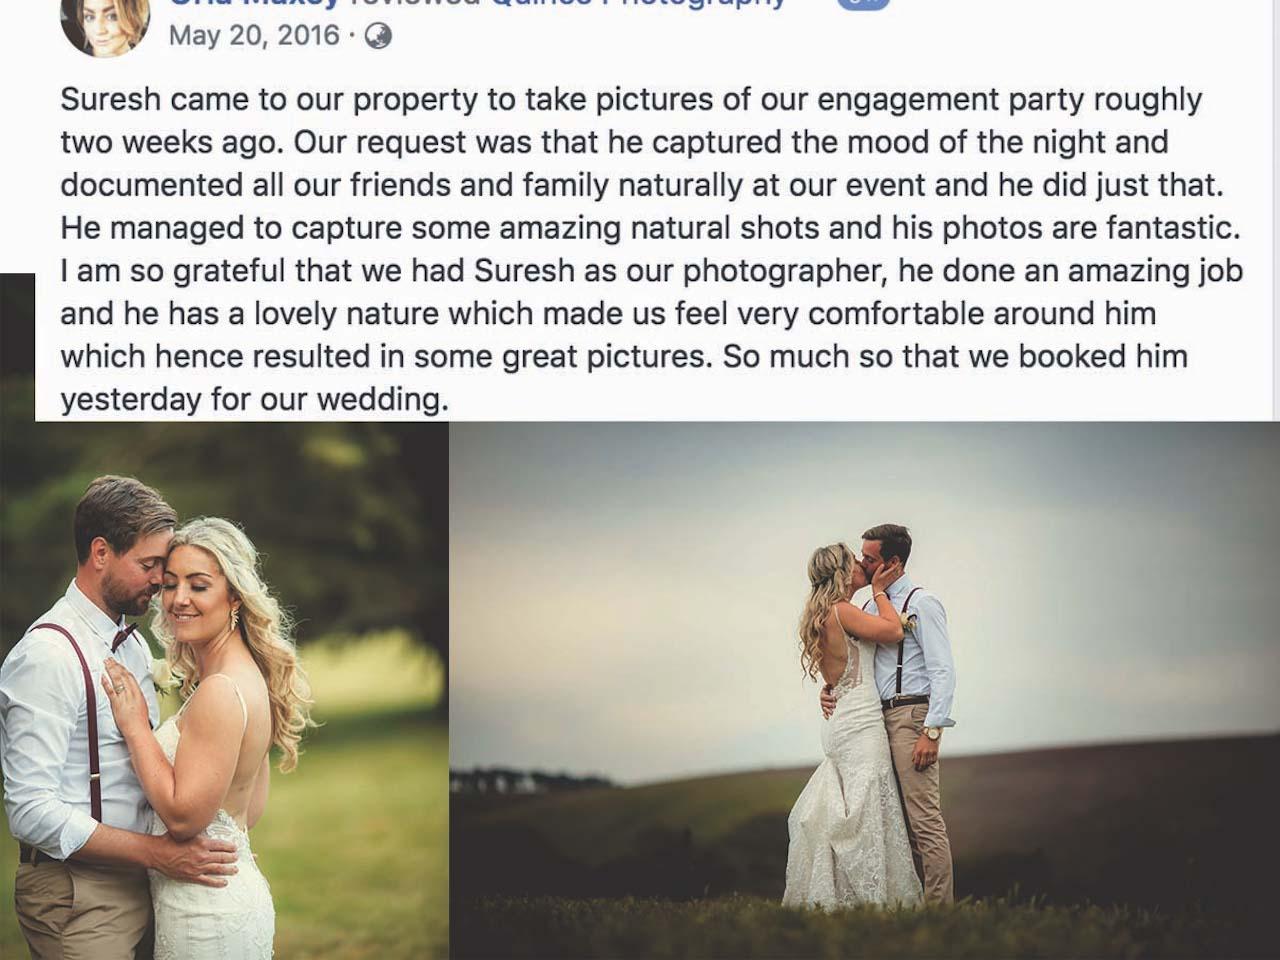 Melbourne wedding photo review 4.jpg